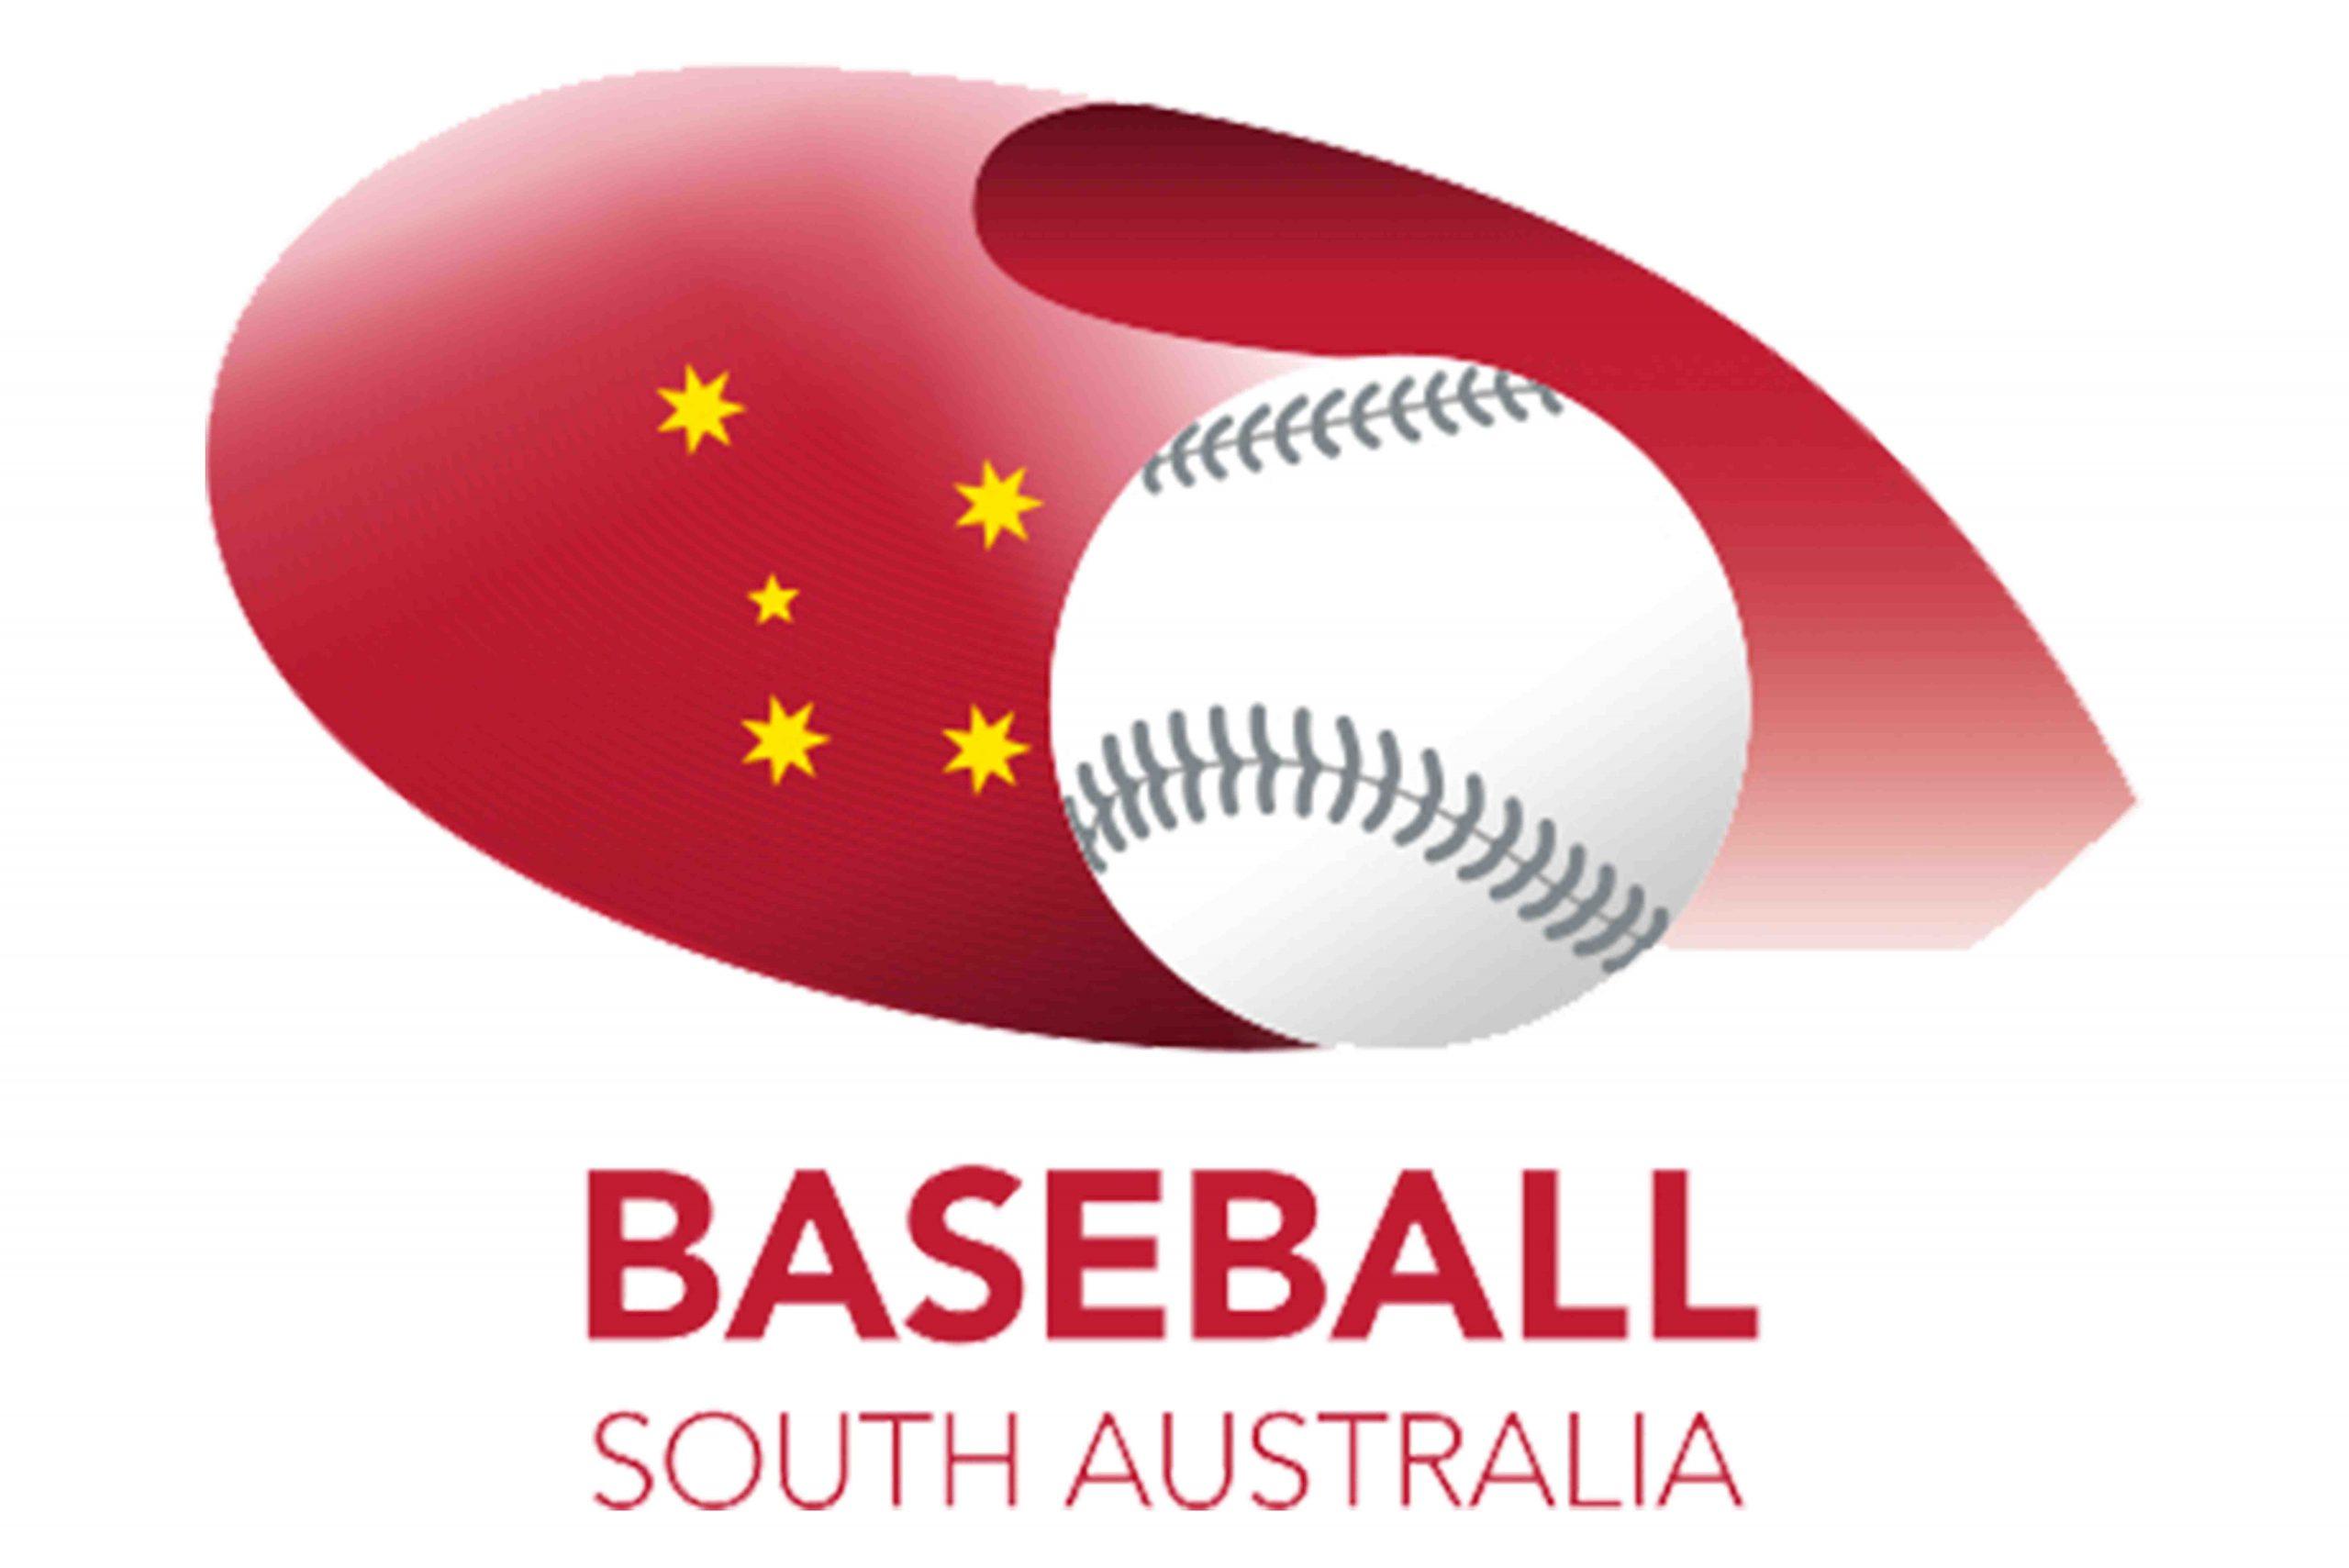 Baseball South Australia logo on a white background